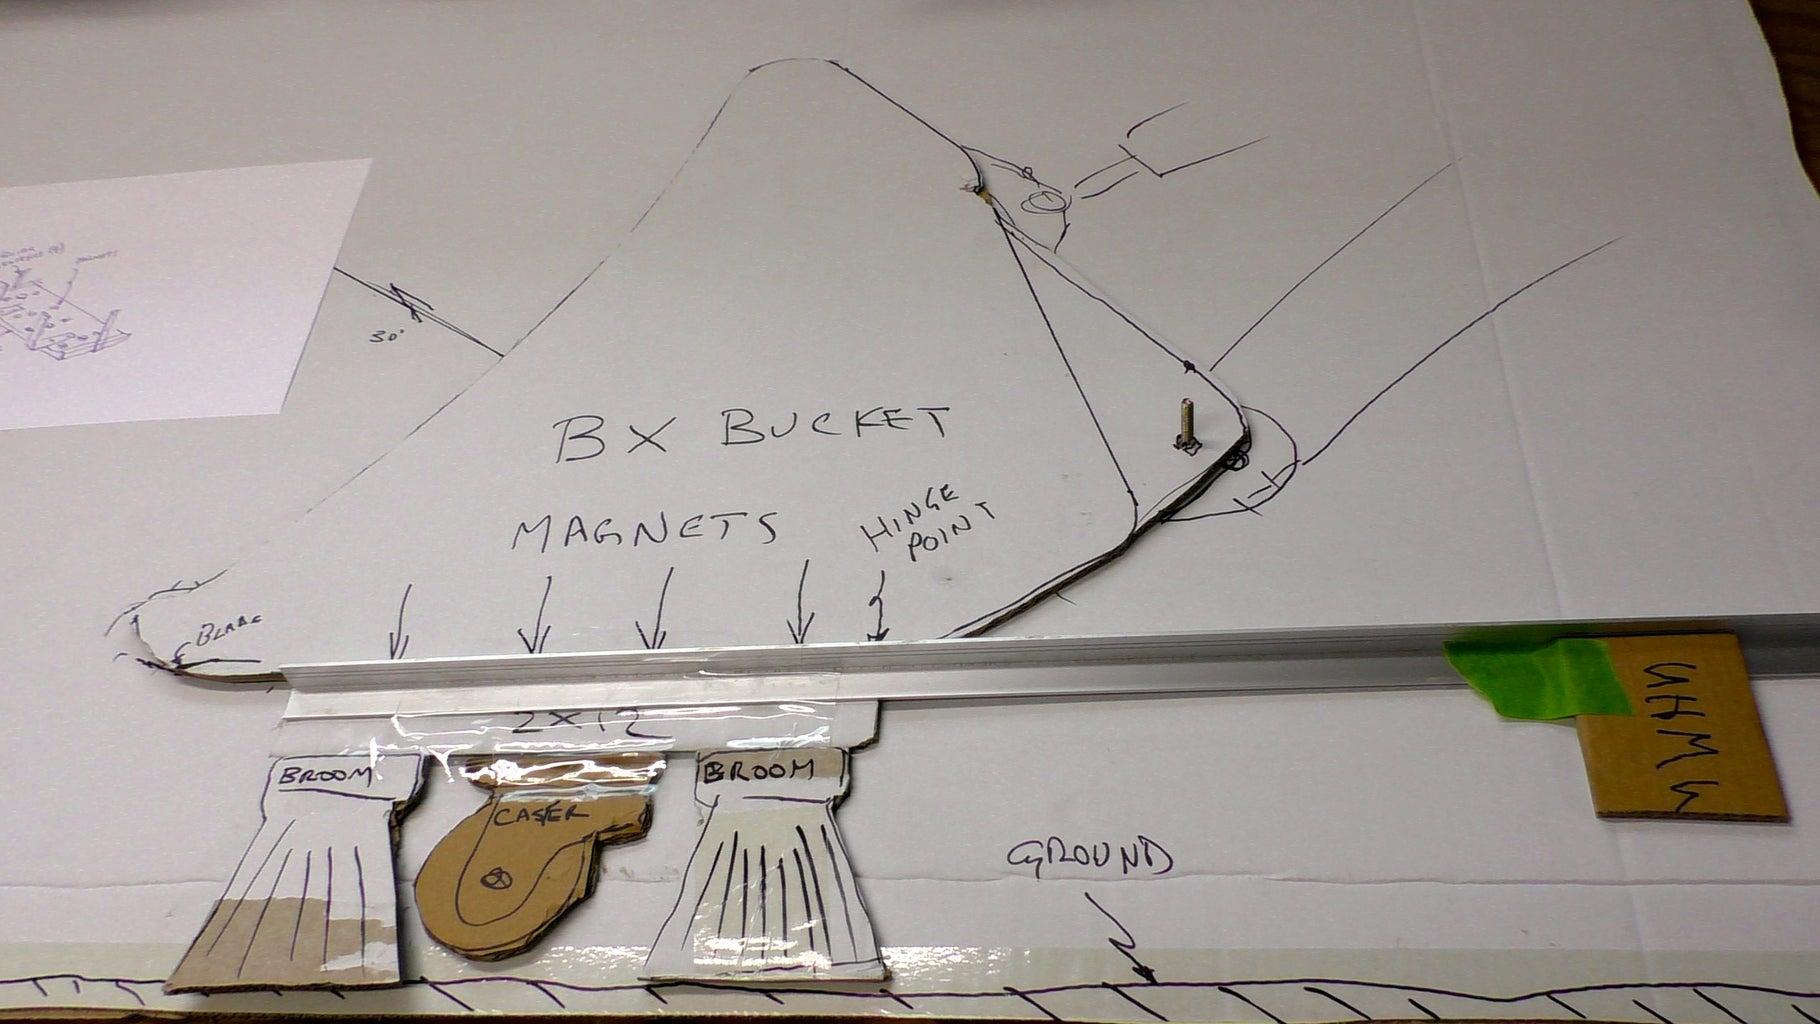 Cardboard Mockup and Rough Prototype